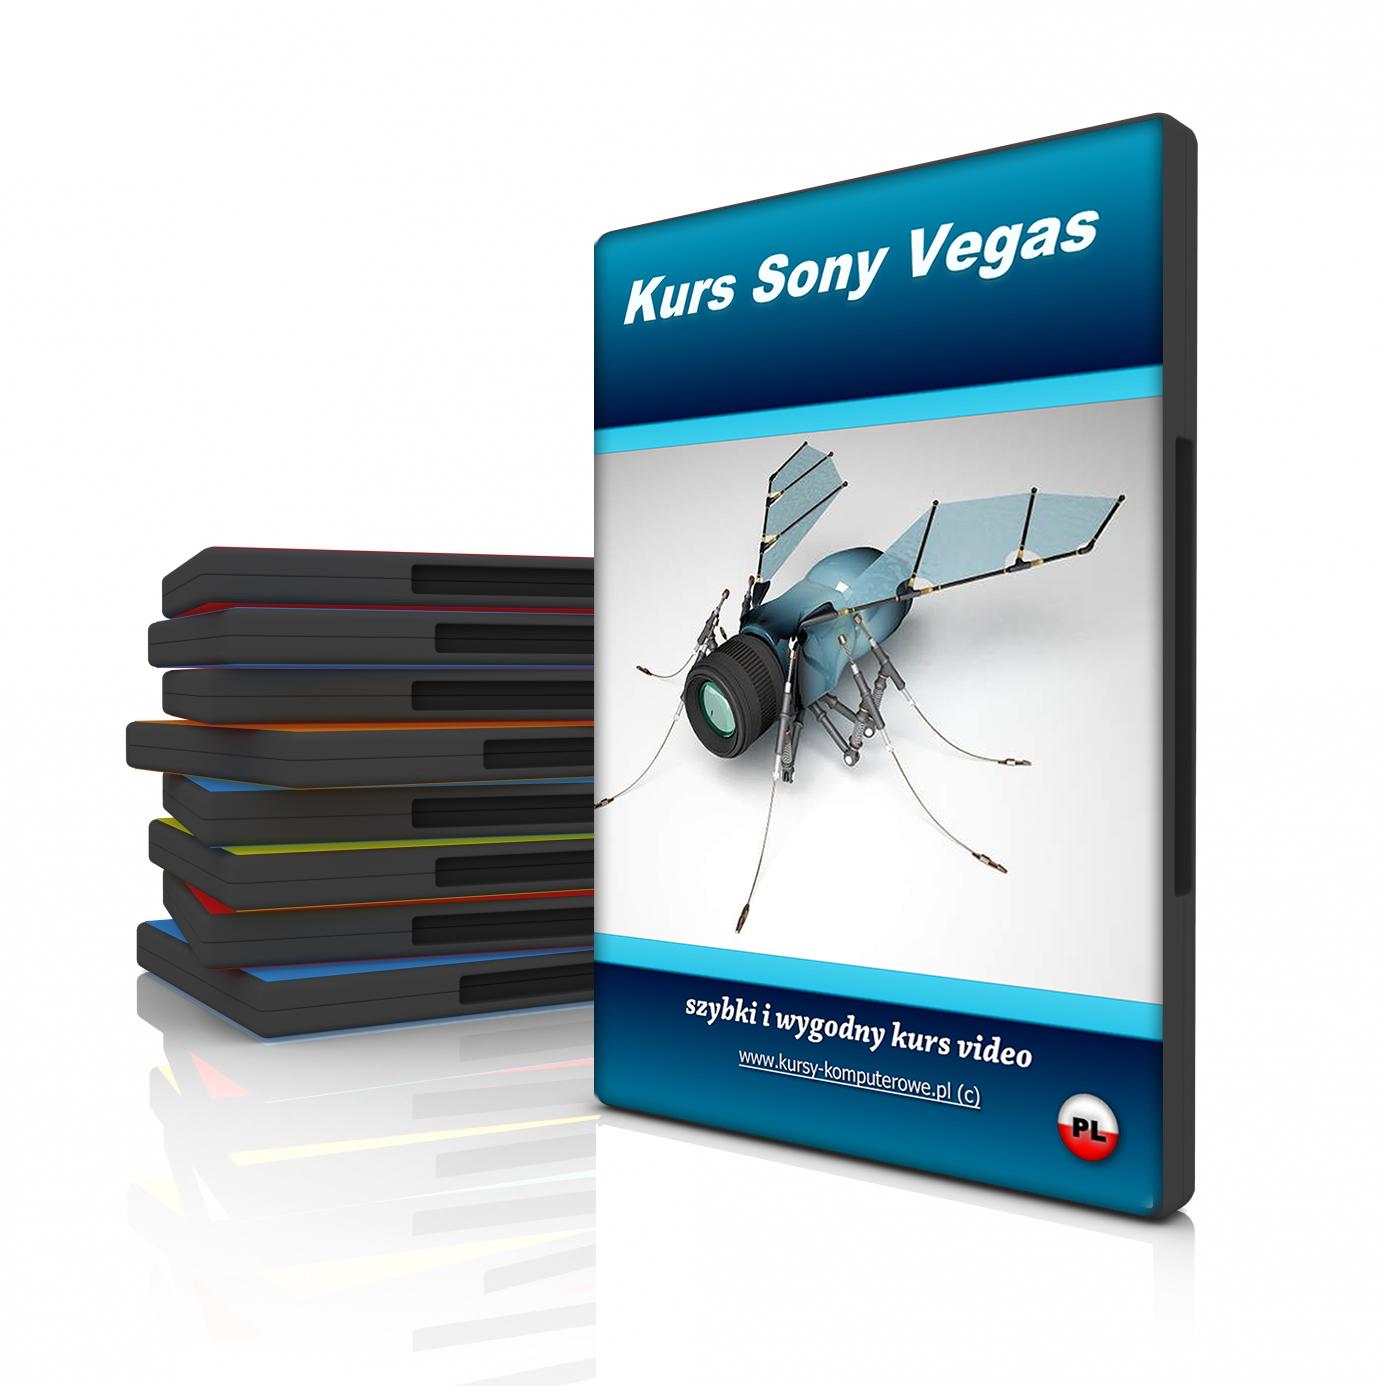 Kurs Sony Vegas